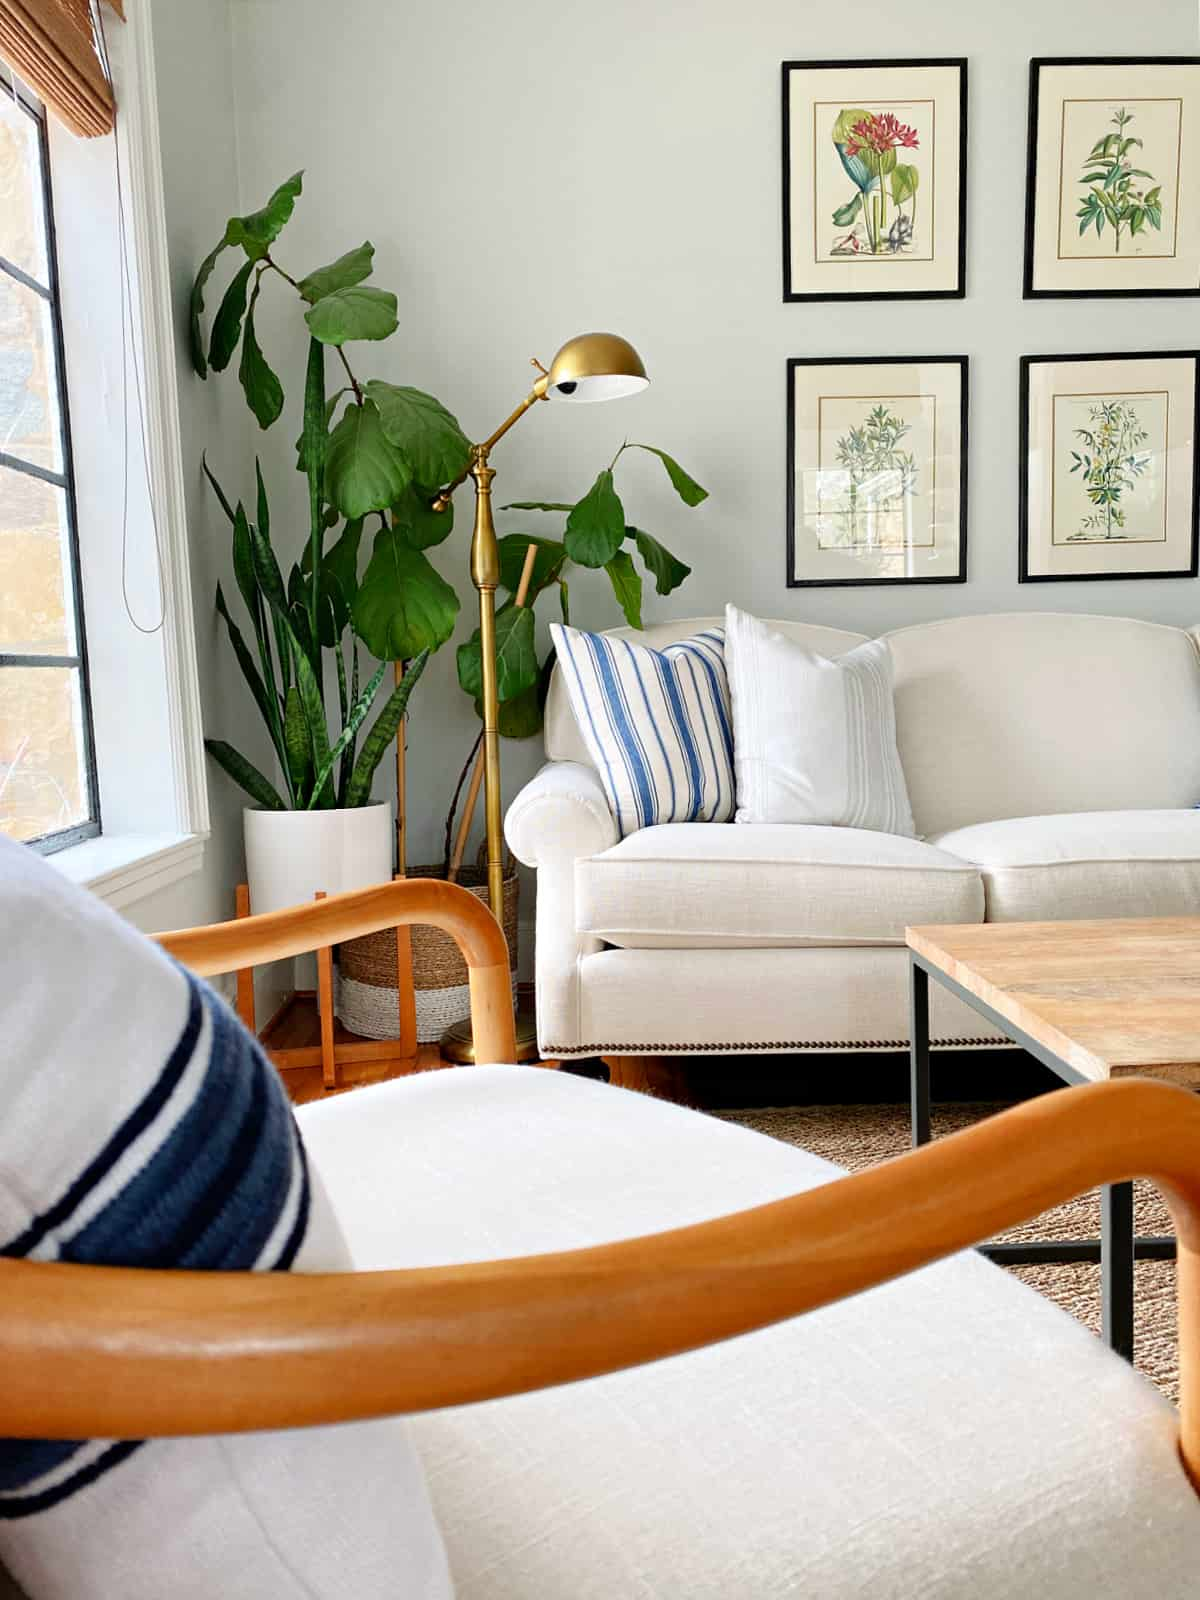 fiddle leaf fig and other plants in corner of living room